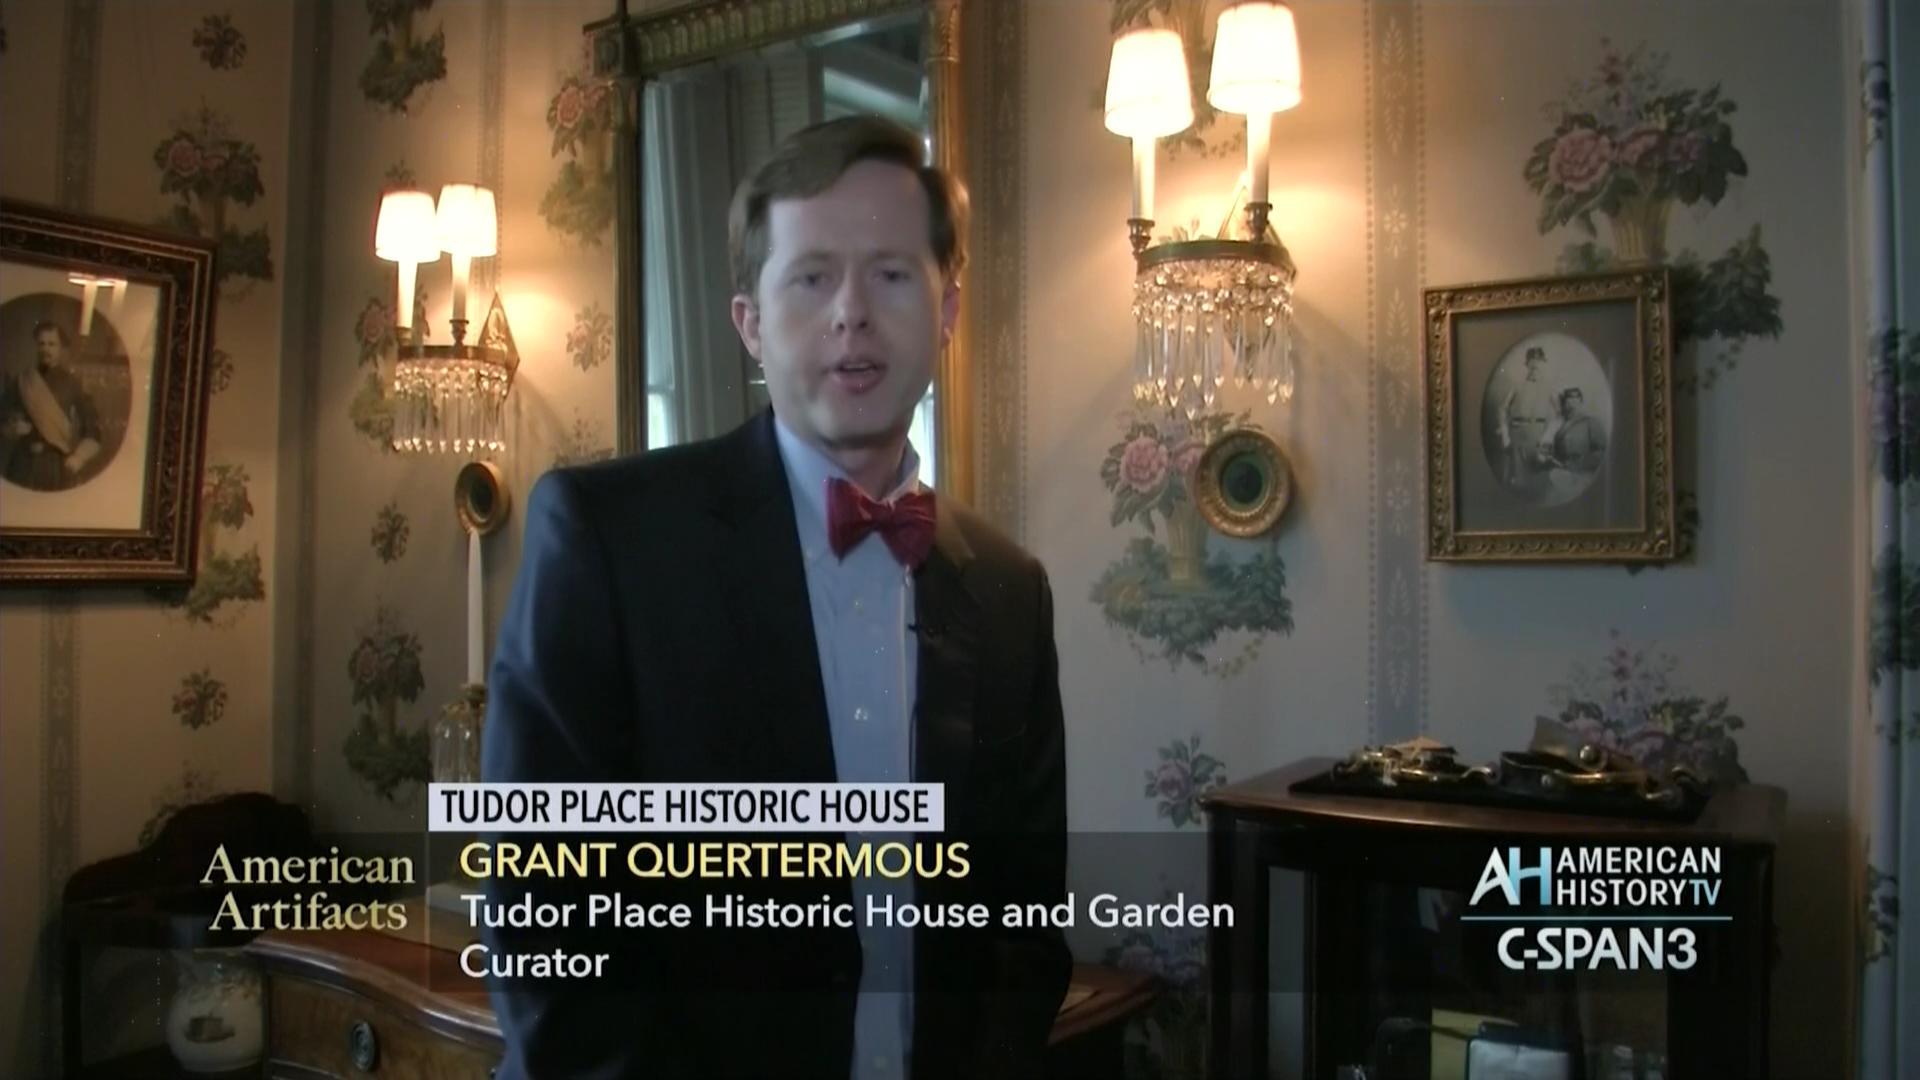 tudor place historic house feb 1 2017 video c span org